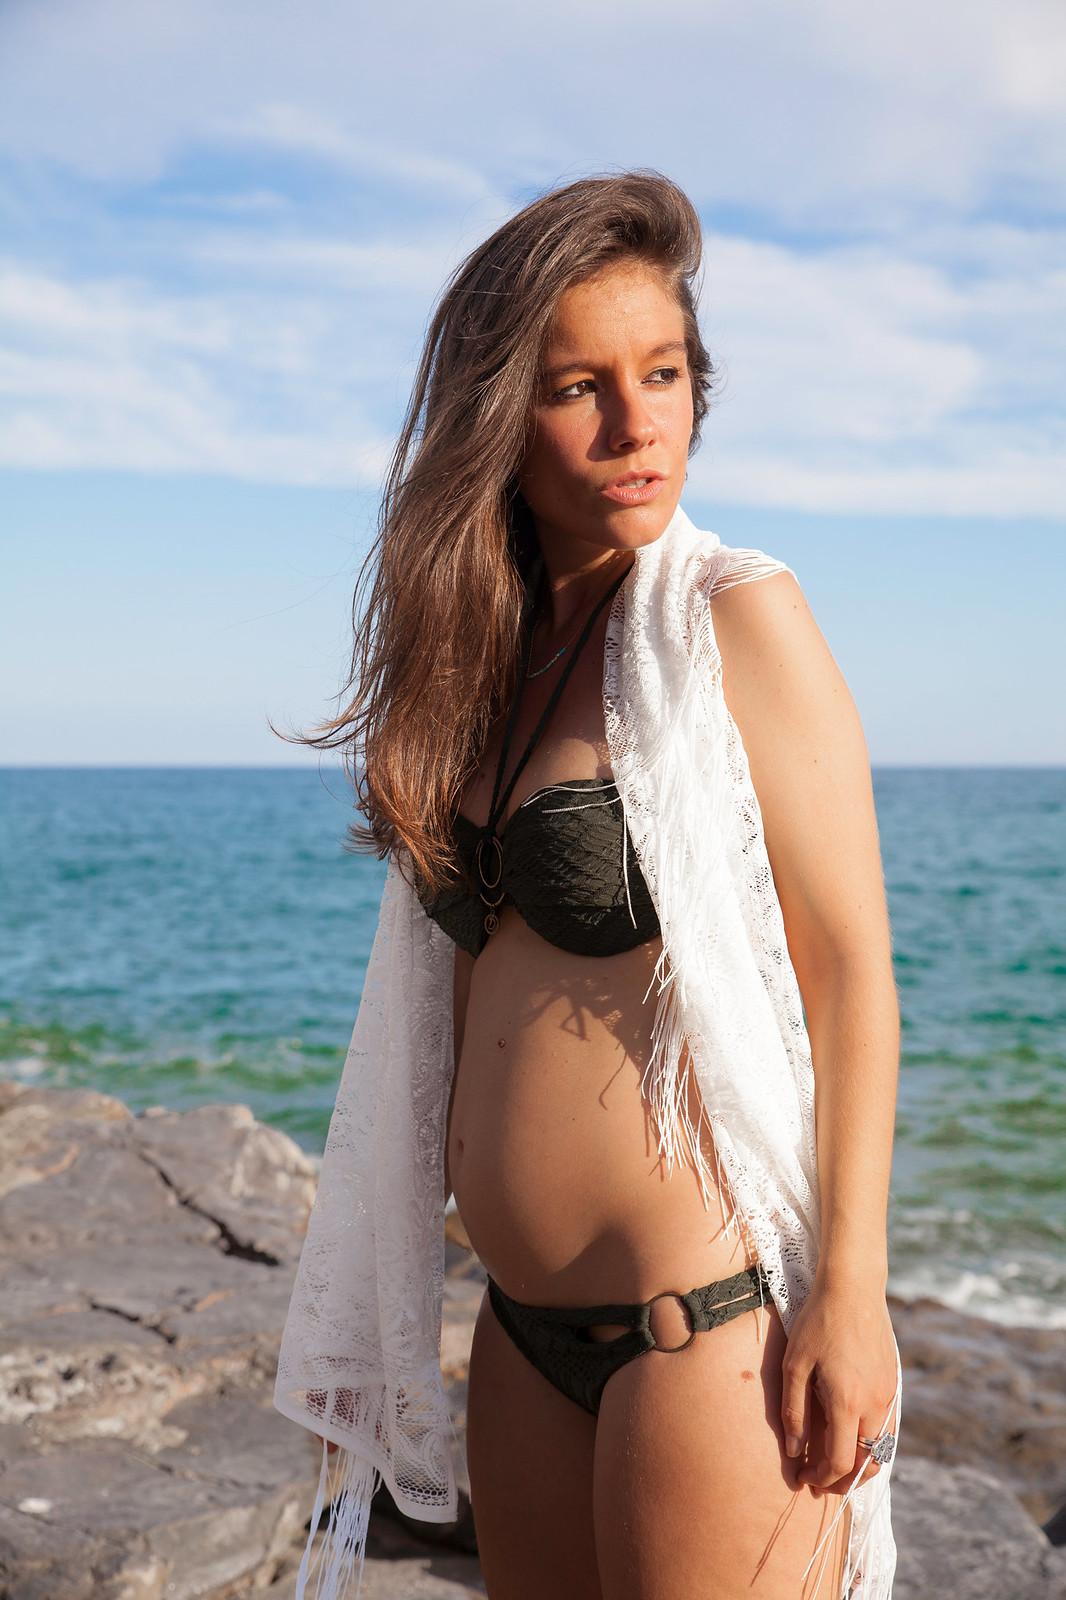 01_Hunker_Moller_Bikini_Comodo_embarazada_theguestgirl_laura_santolaria_influencer_moda_embarazada